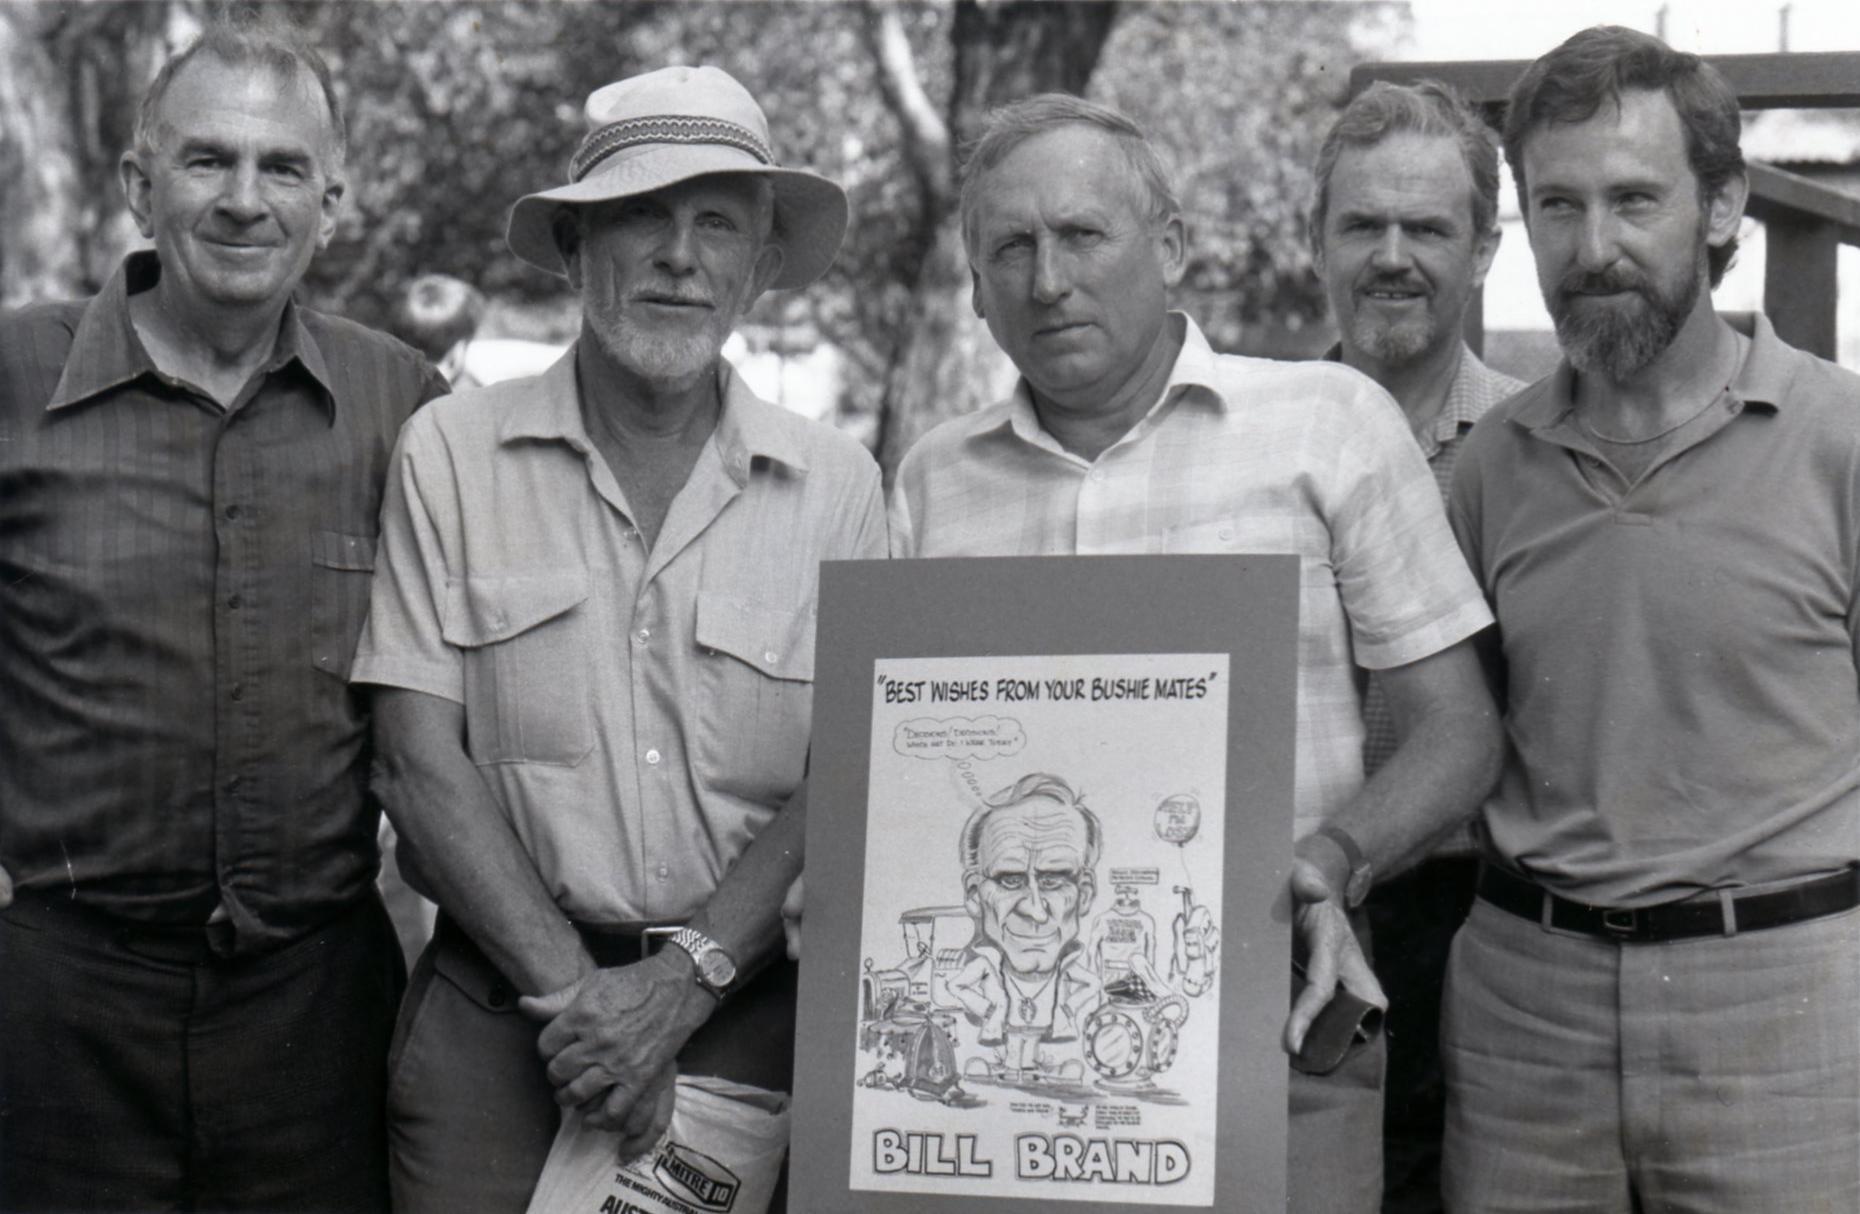 Bill Bewsher, Stuart Brookes, Bill Brand, Rod Lindgard and Phil Waring